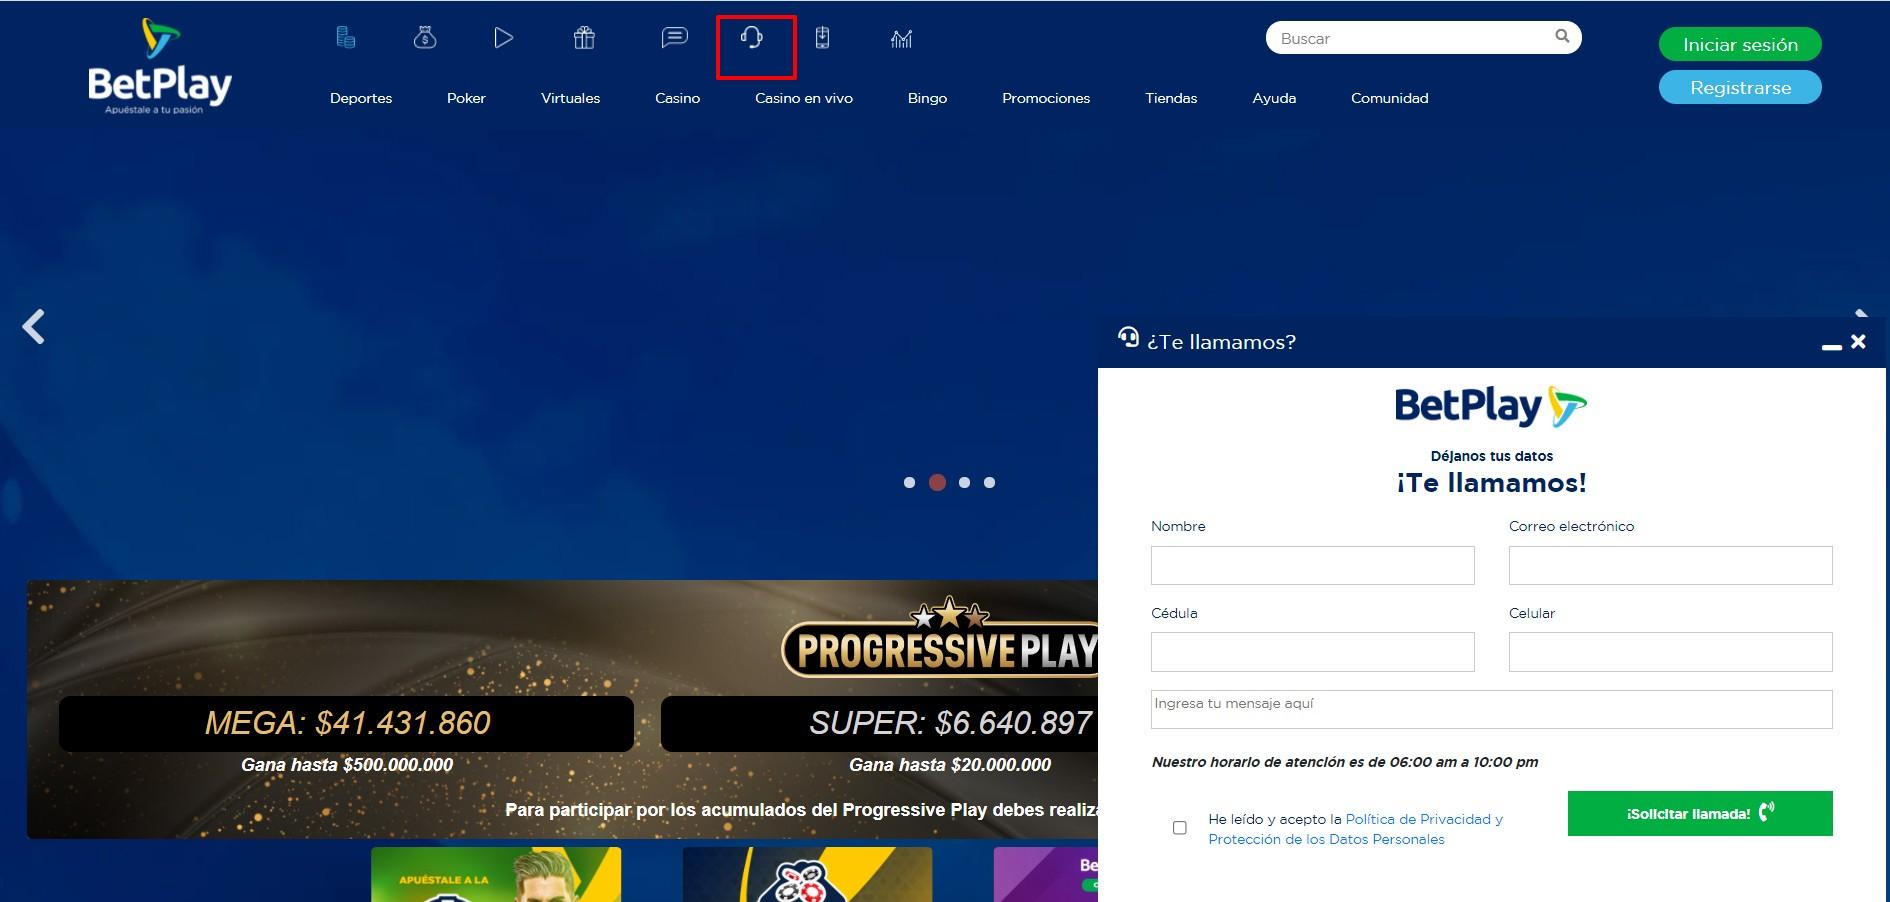 Форма обратной связи на сайте БК BetPlay